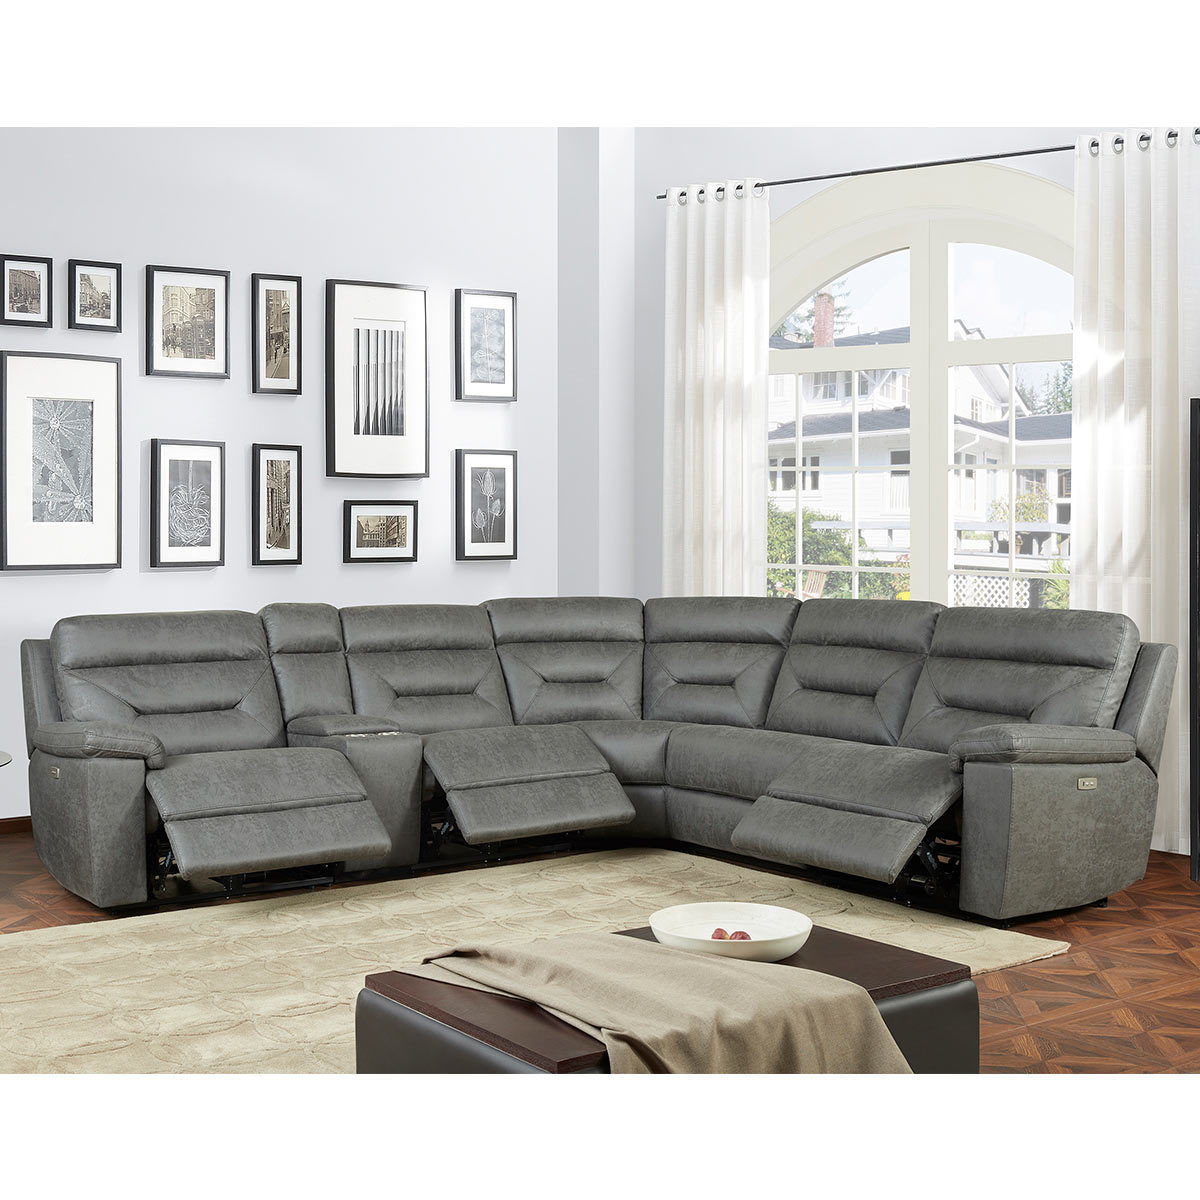 القرف سقط تتالي corner sofa with console